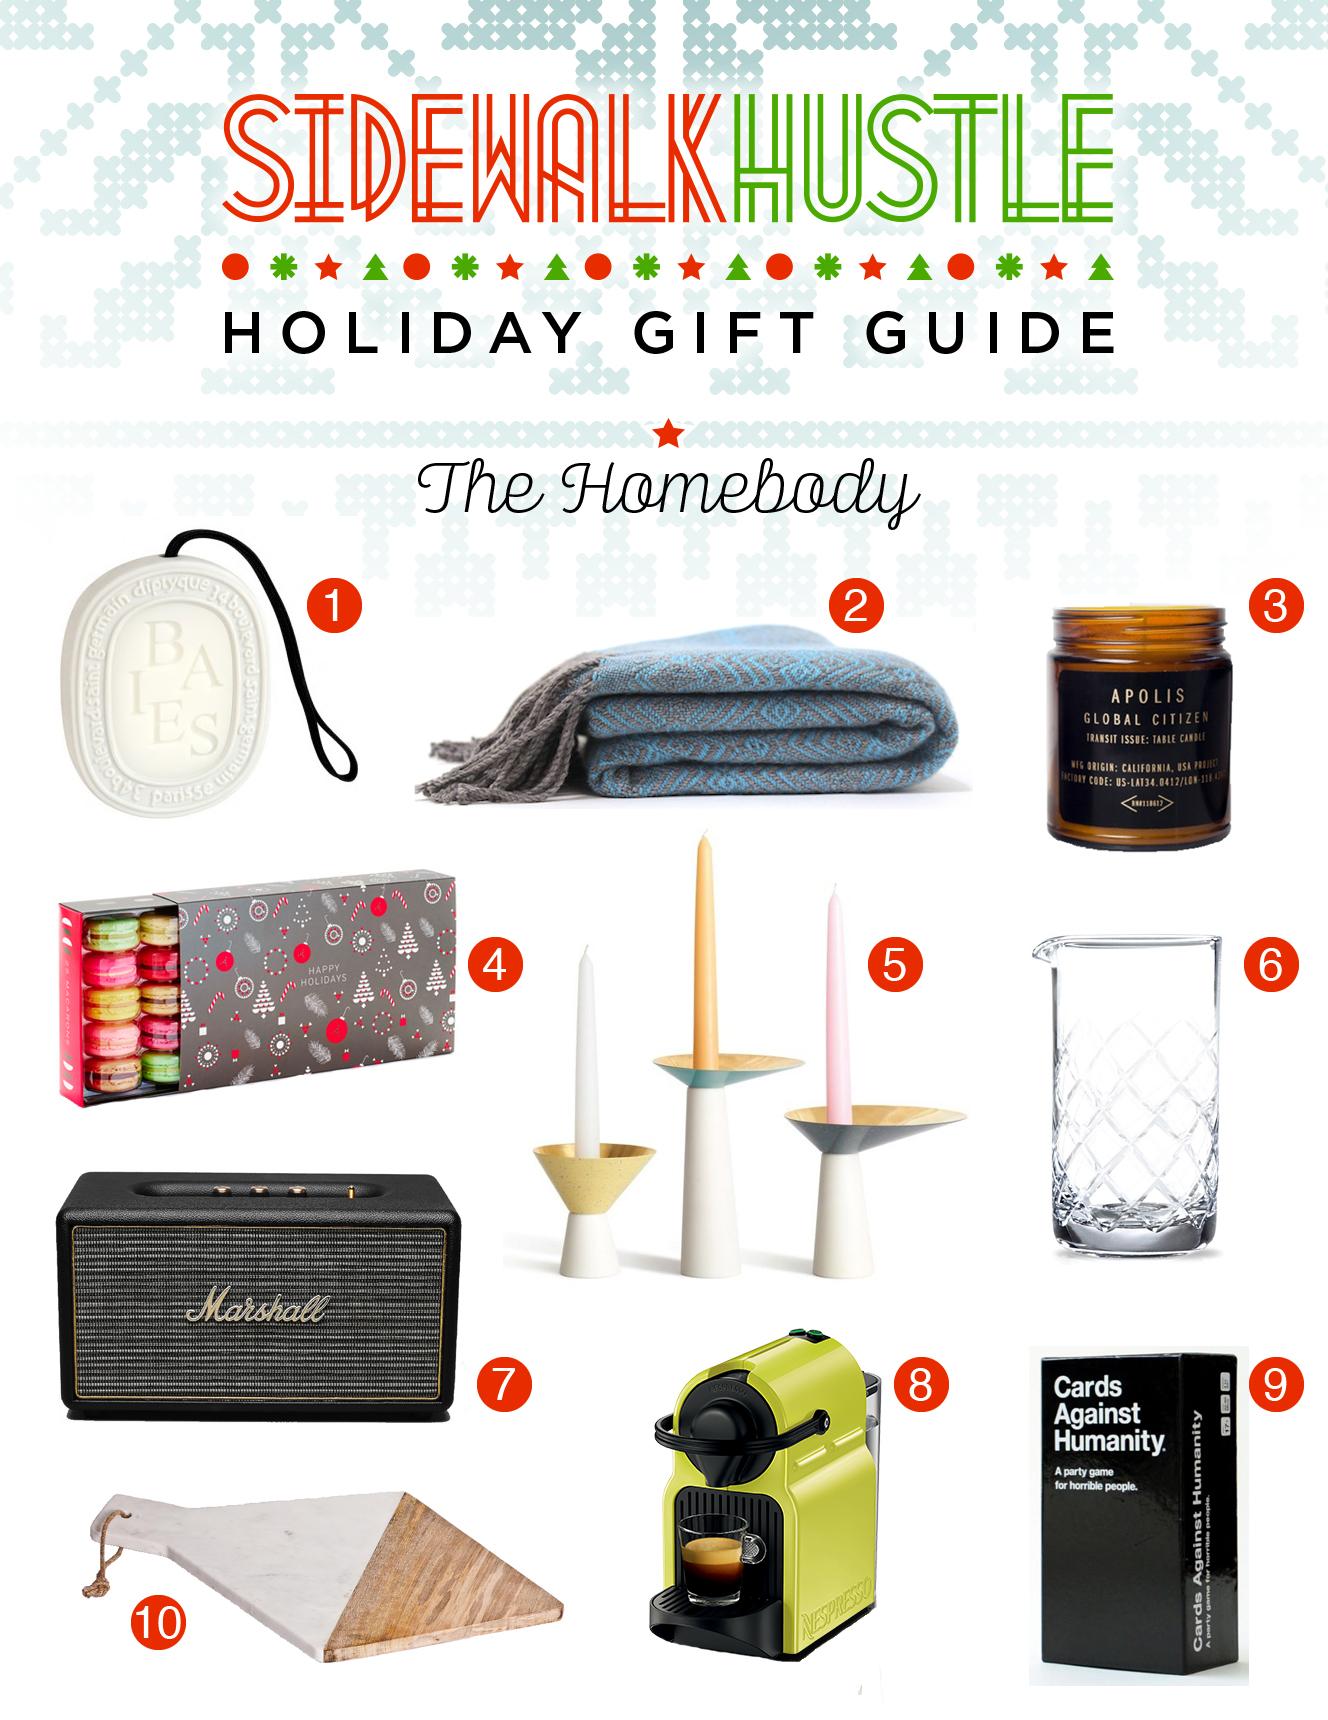 Sidewalk Hustle Holiday Gift Guide 2014 - The Homebody